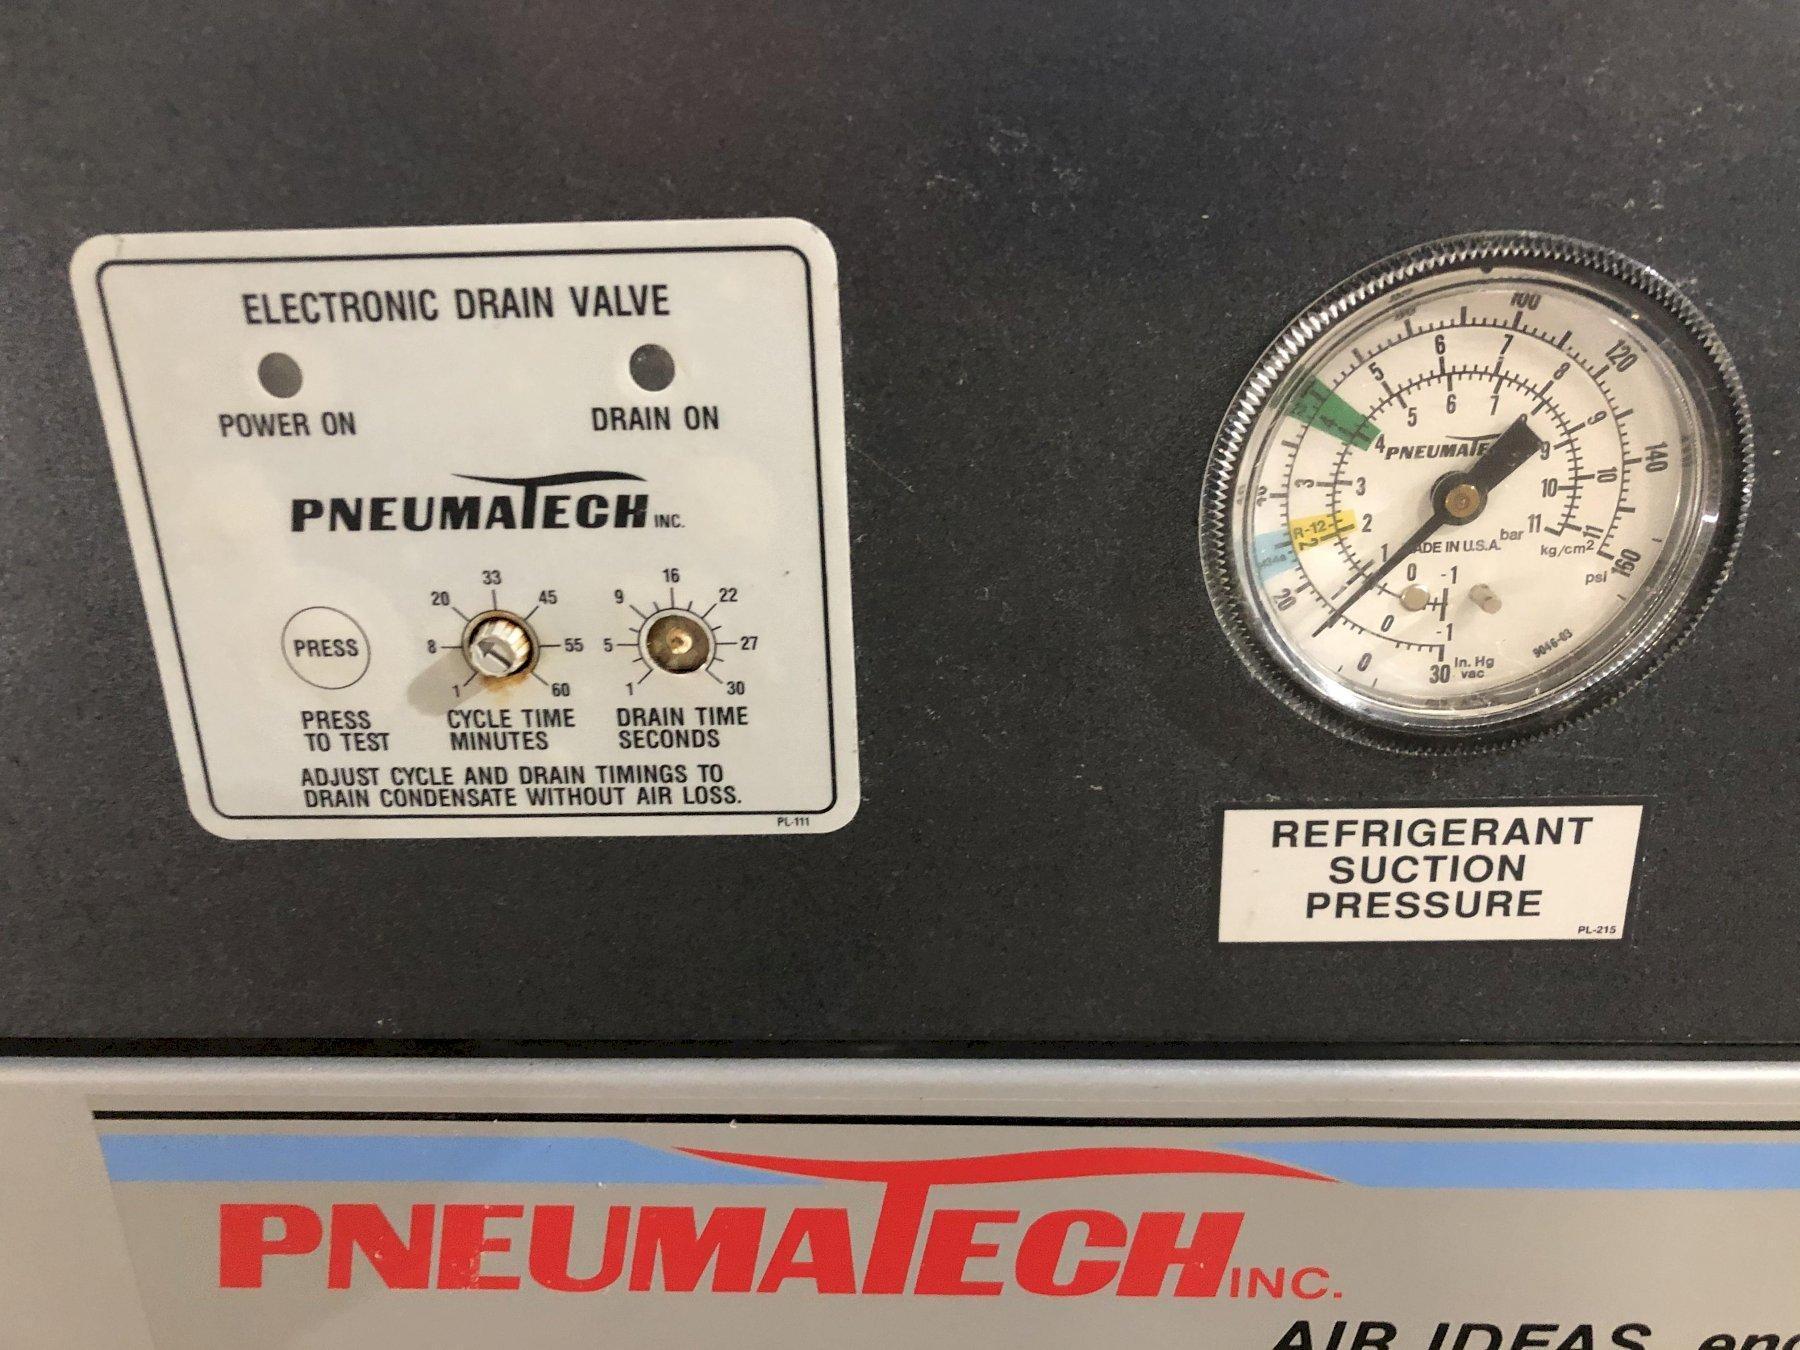 100 SCFM PNEUMATECH MODEL AD-100 AIR DRYER: STOCK #13773